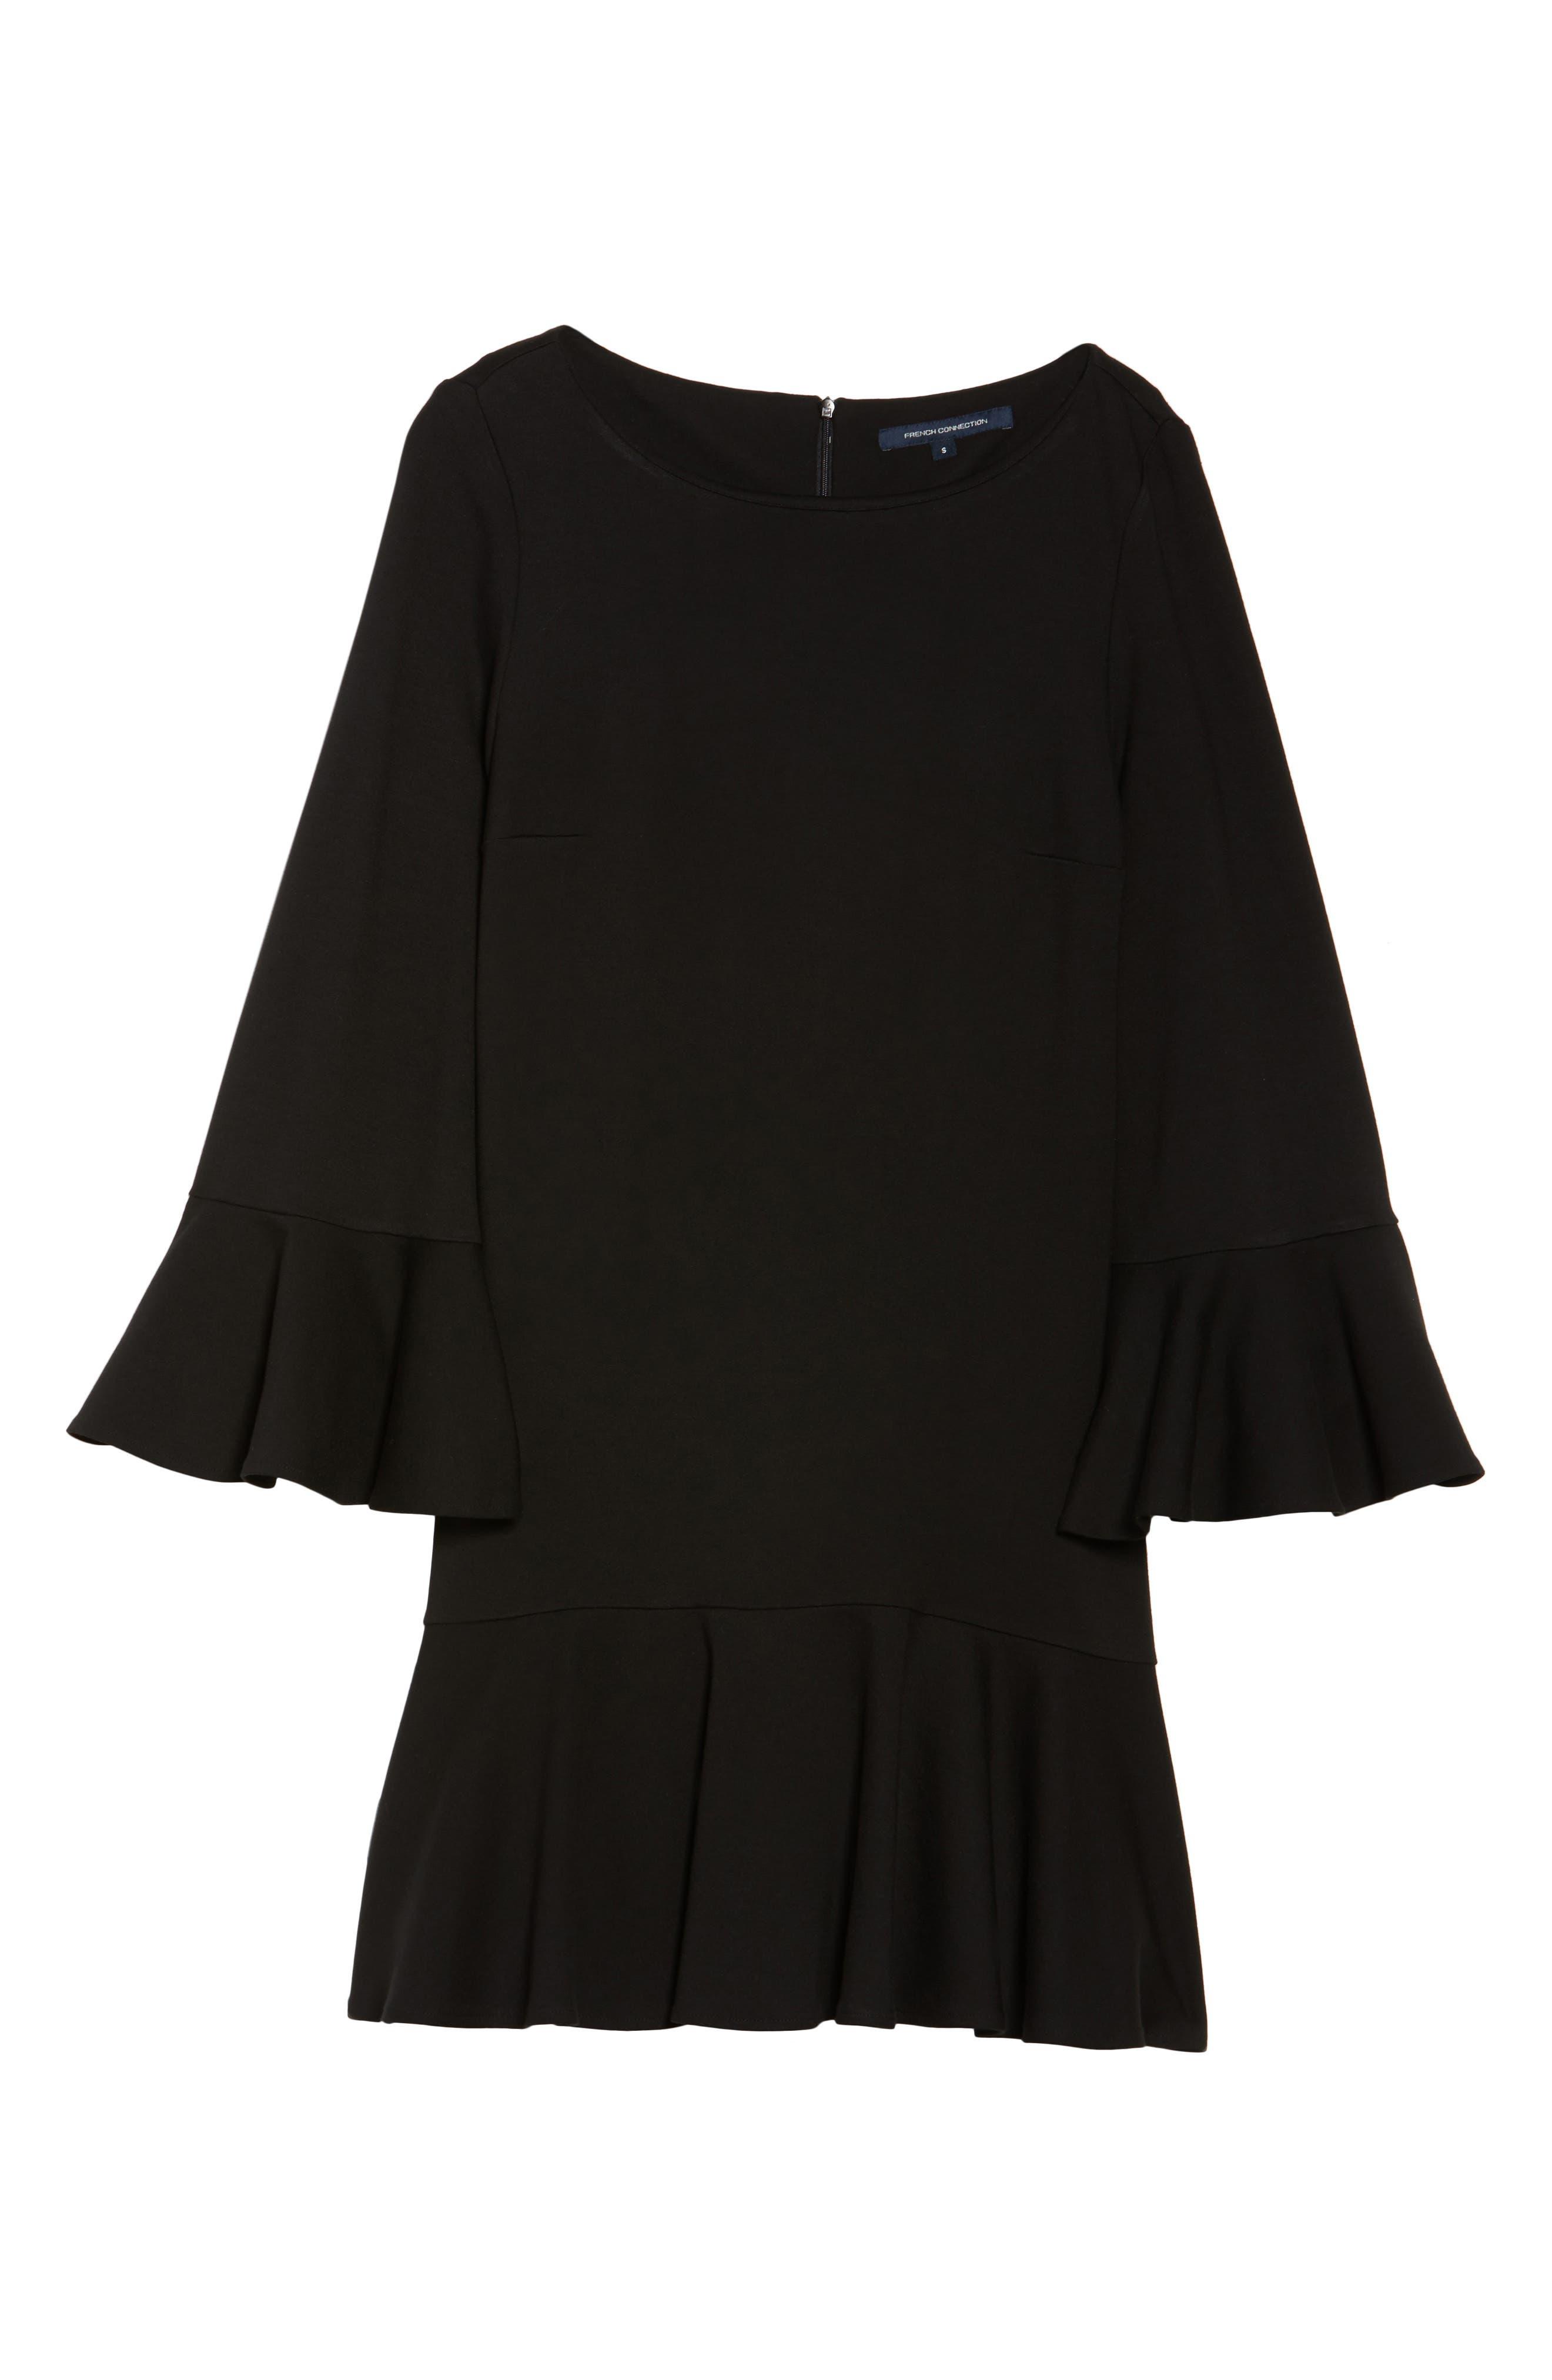 Matuku Lula Bell Sleeve Dress,                             Alternate thumbnail 6, color,                             Black